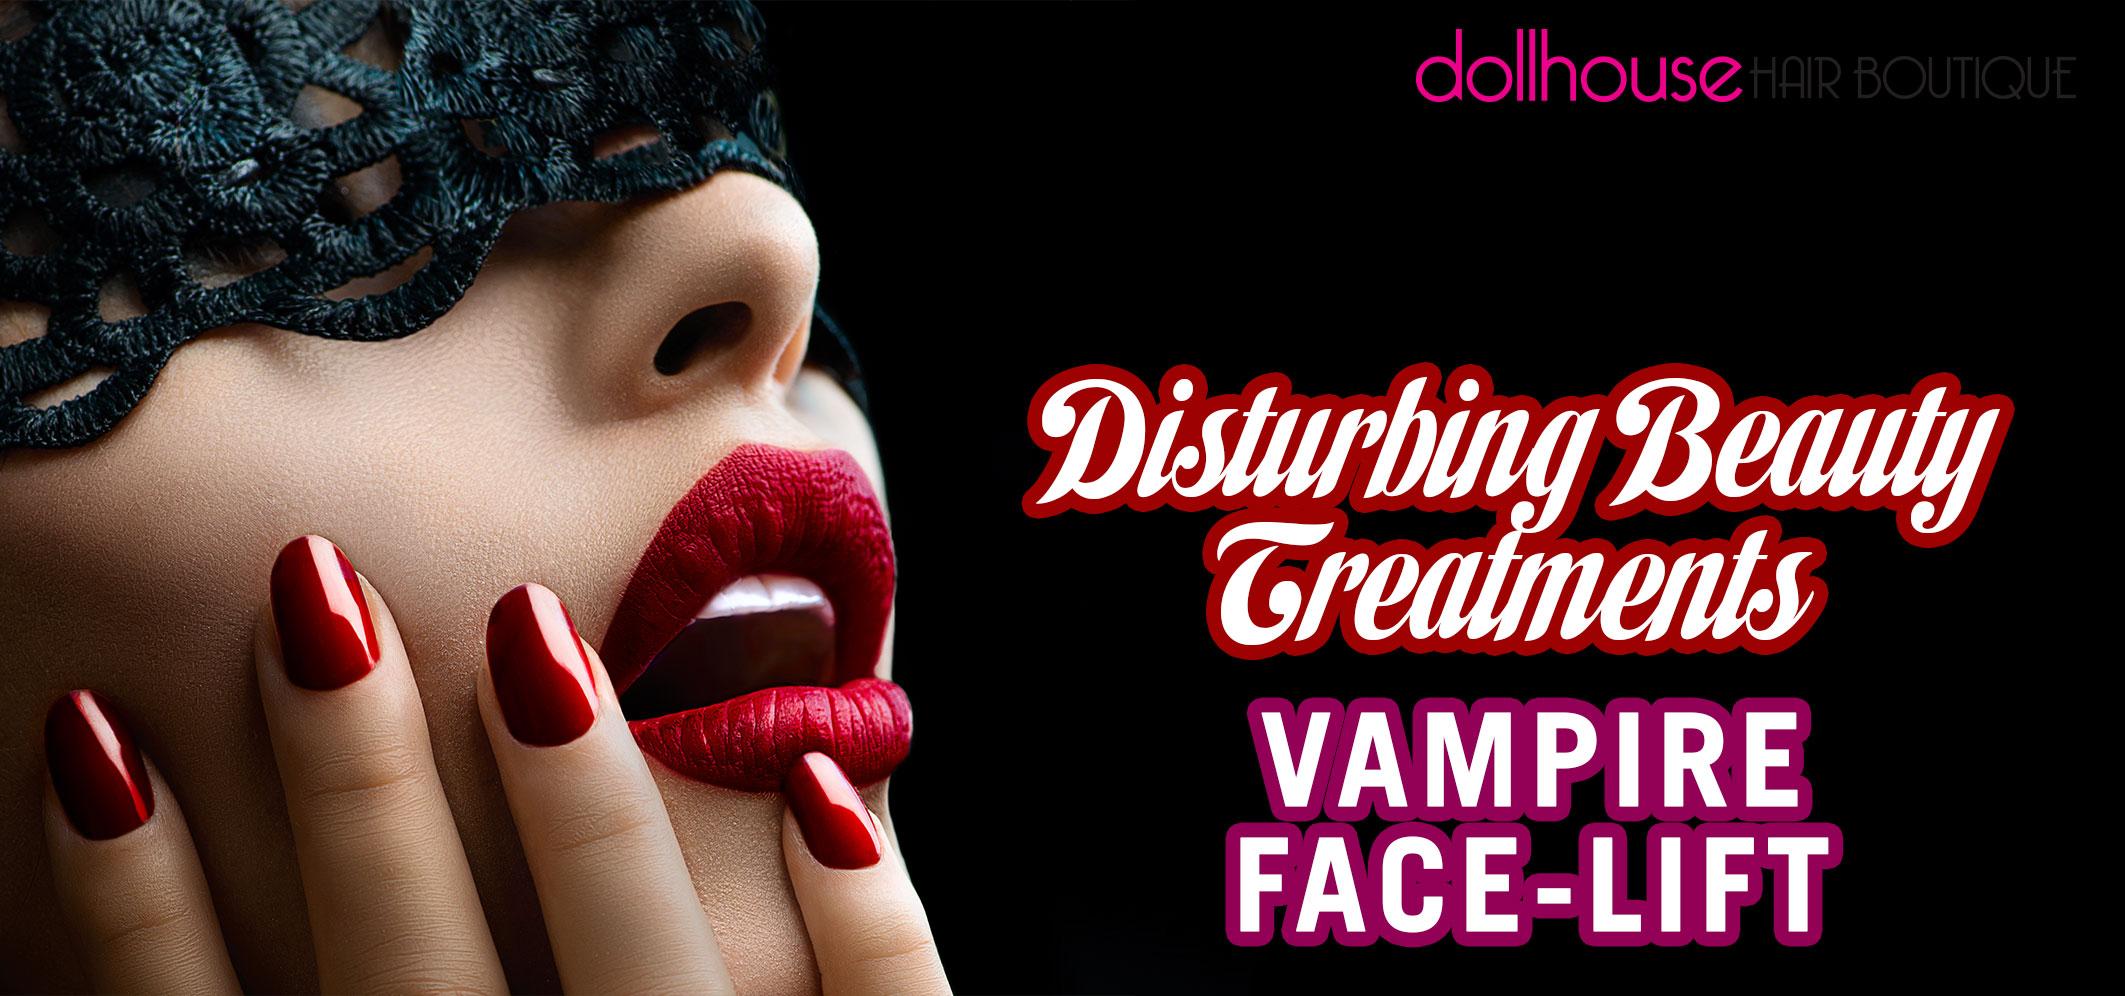 disturbing-beauty-treatments-vampire-facelift